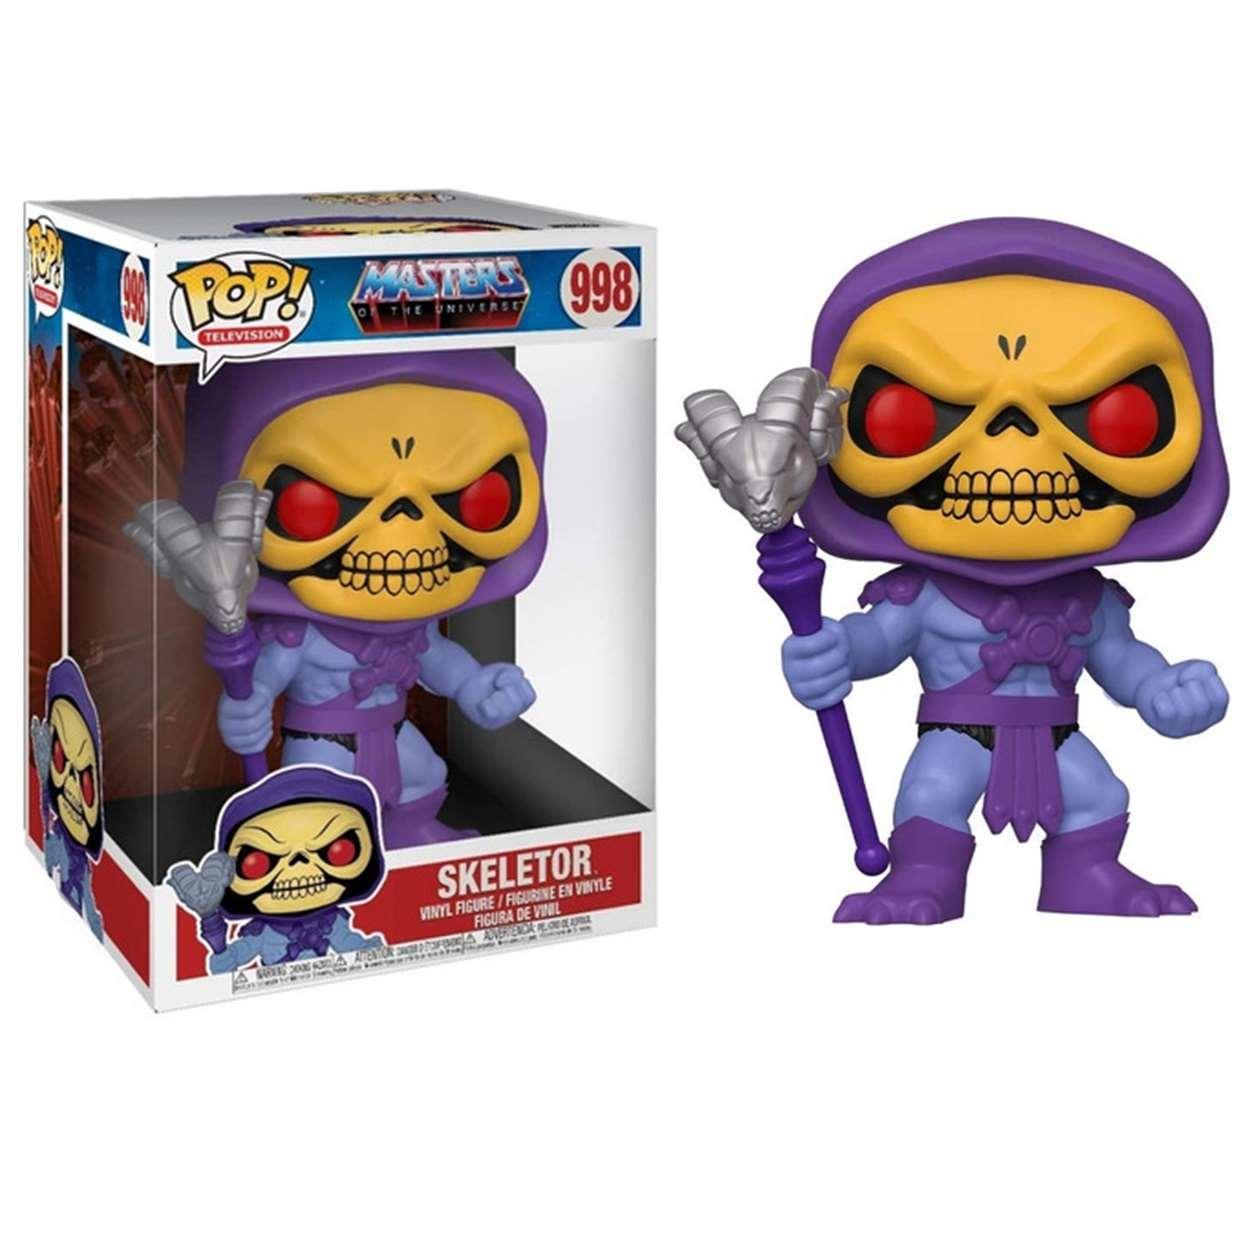 Skeletor #998 Figura Master Of The Universe Funko Pop! Tv